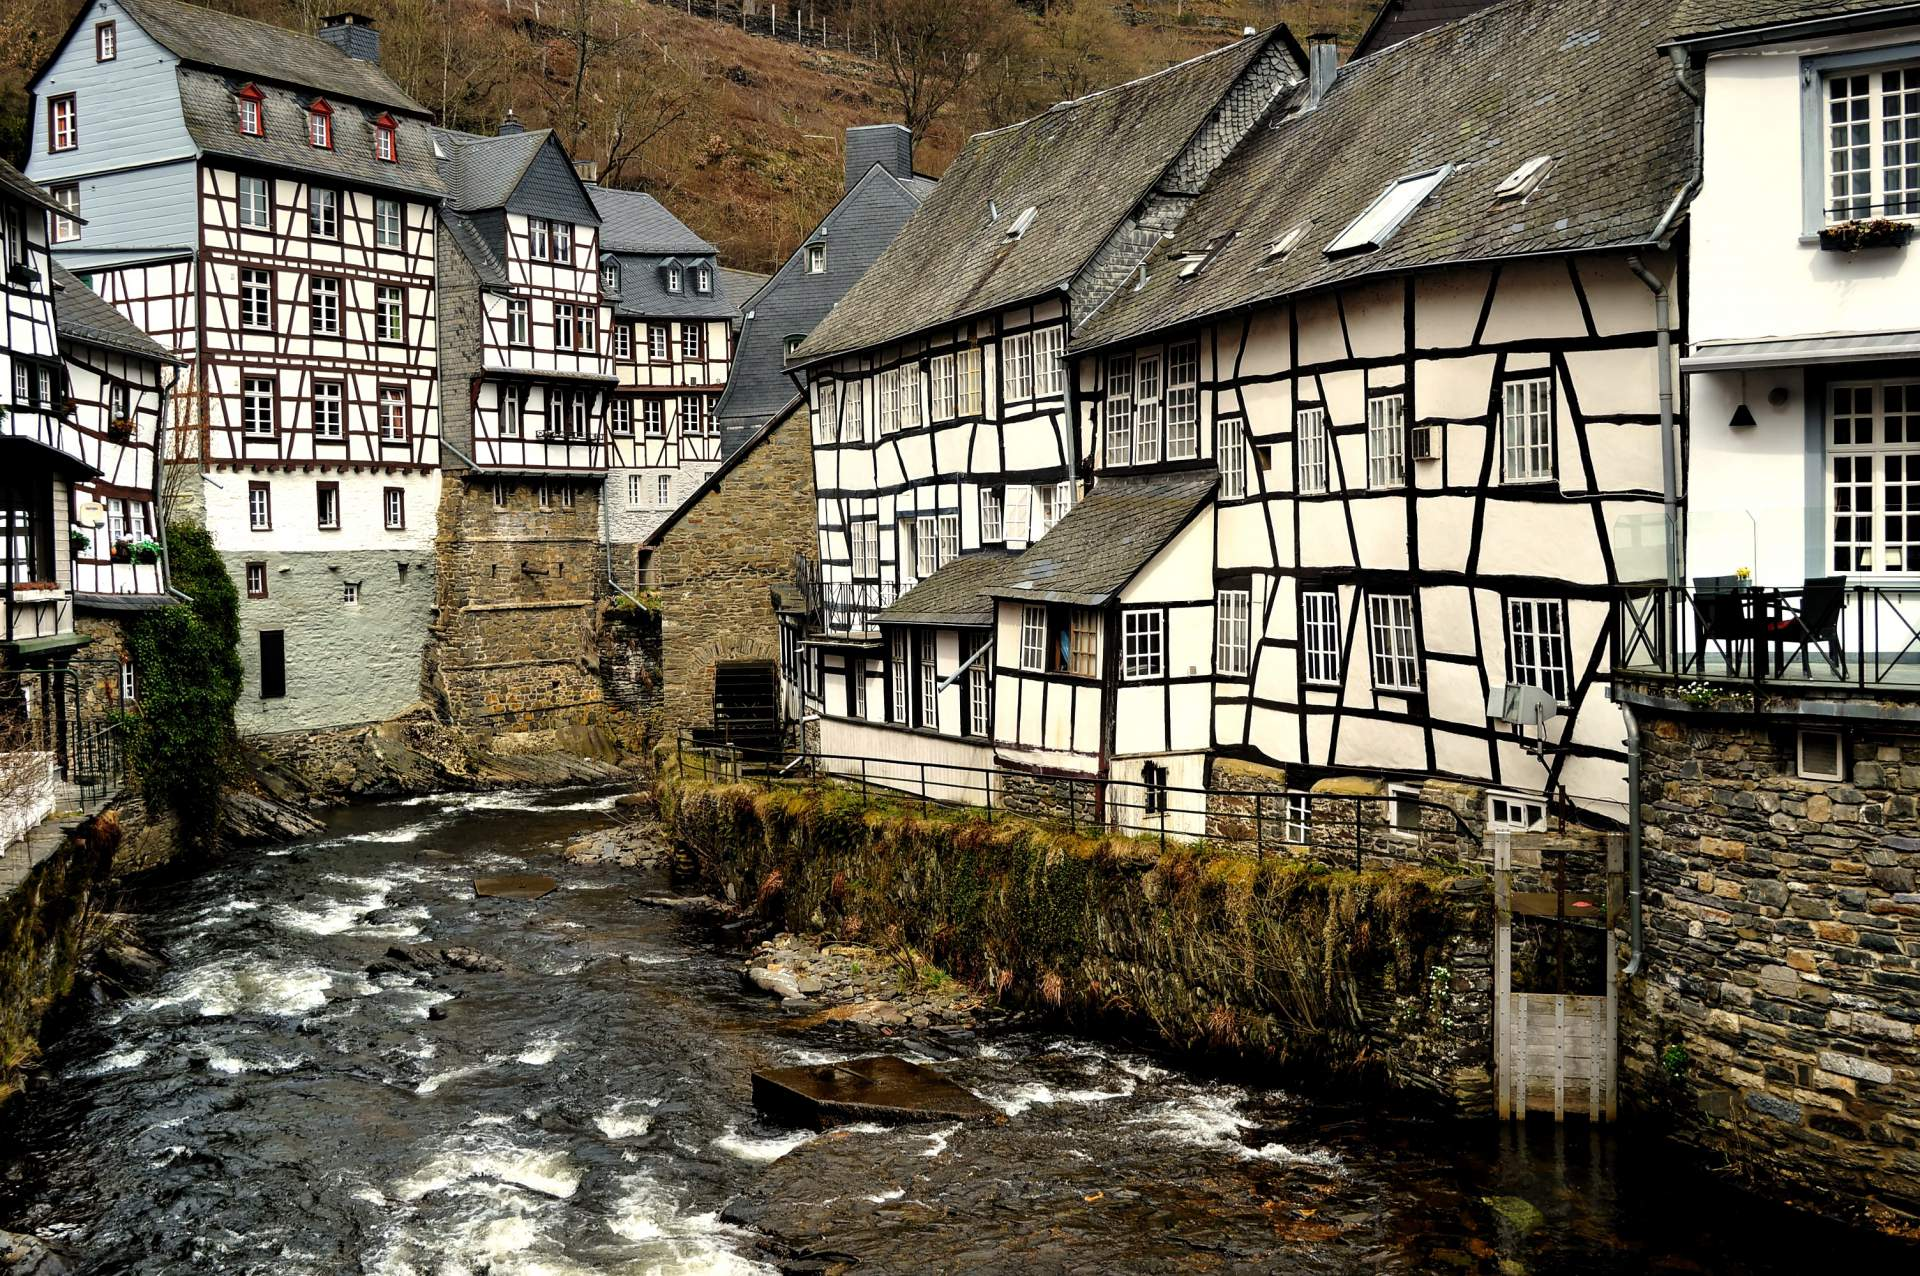 Nationaal Park Eifel: Monschau & Einruhr